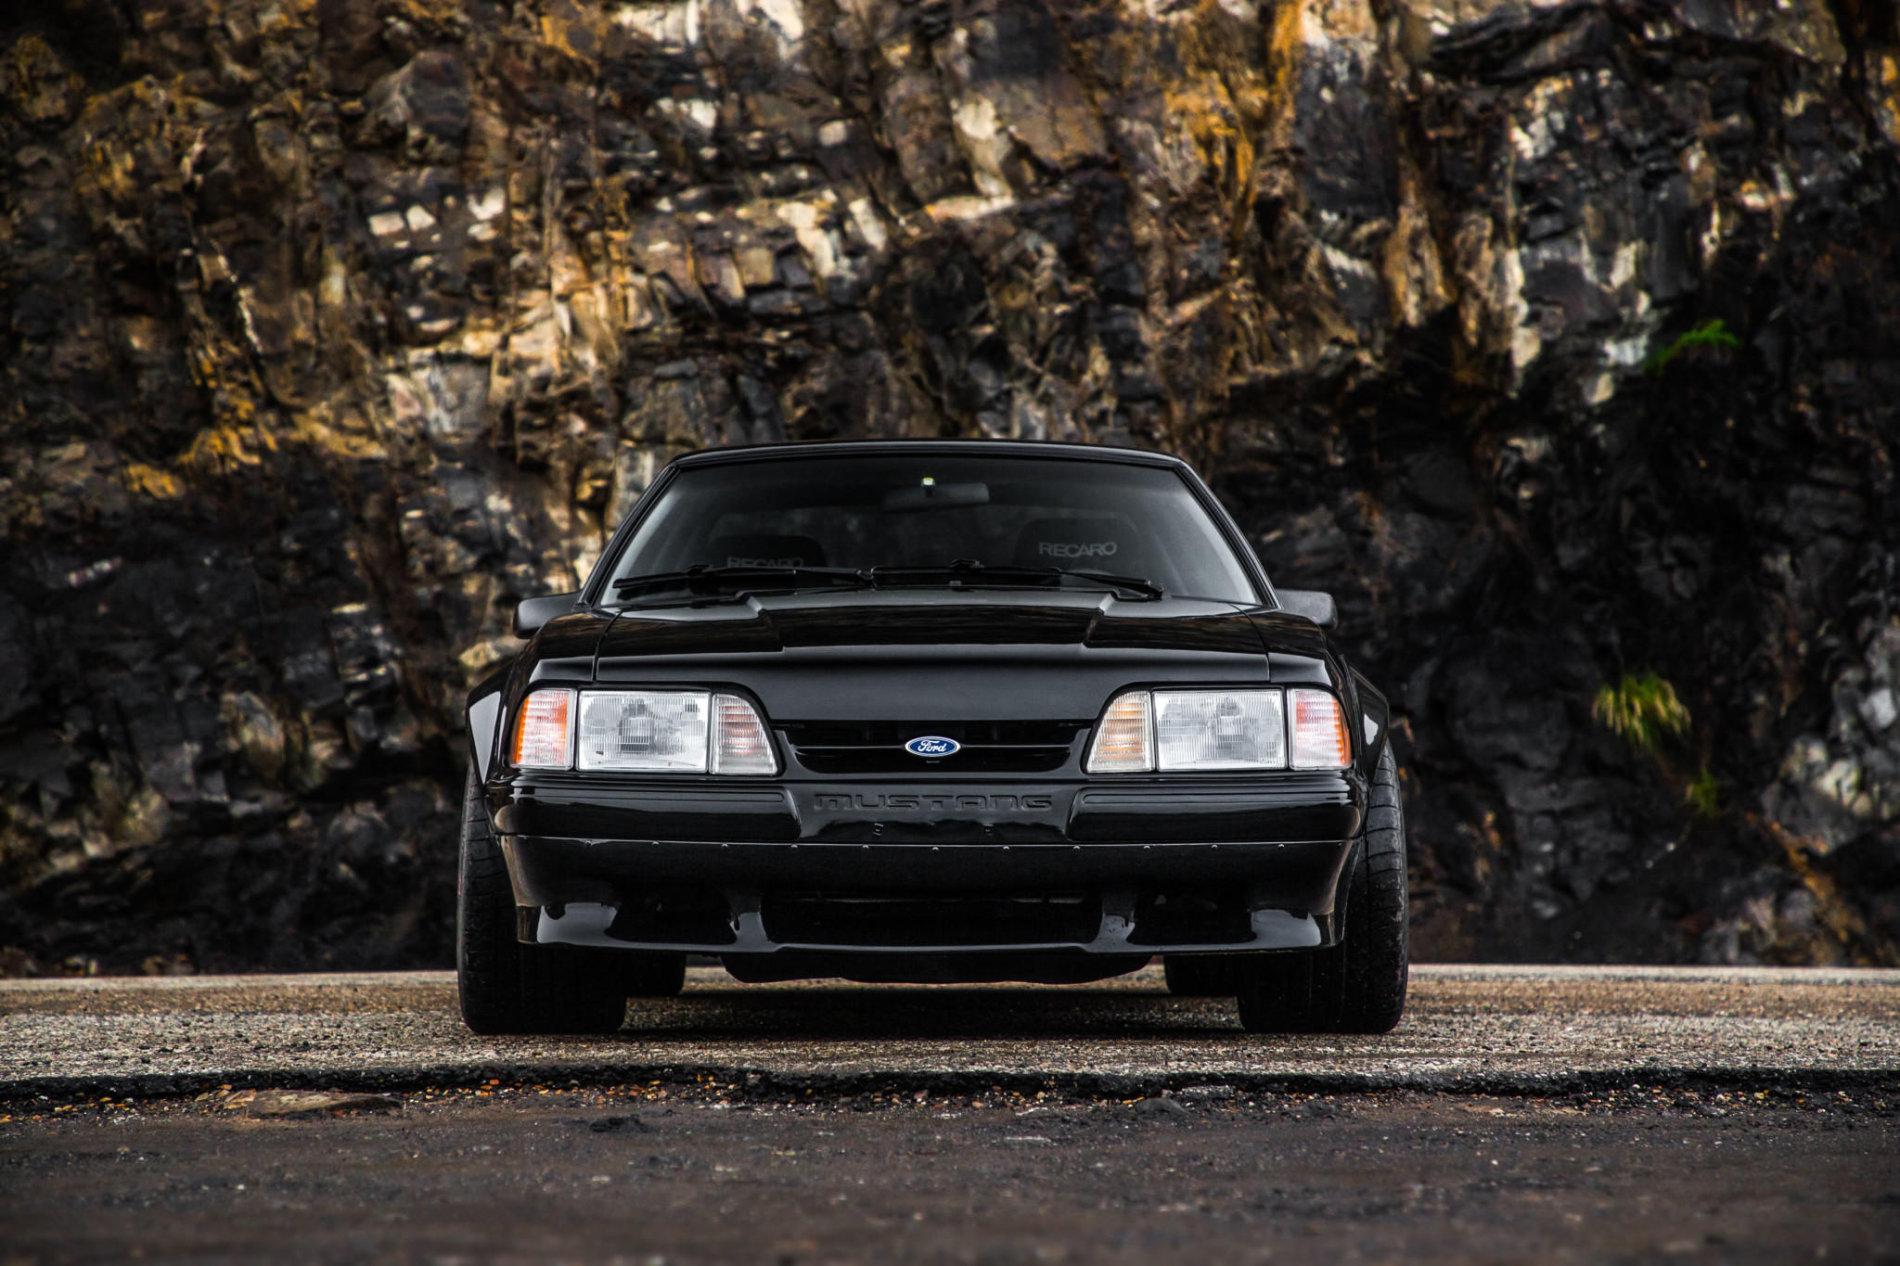 Mustang Fox Body de vanzare - Mustang Fox Body de vanzare